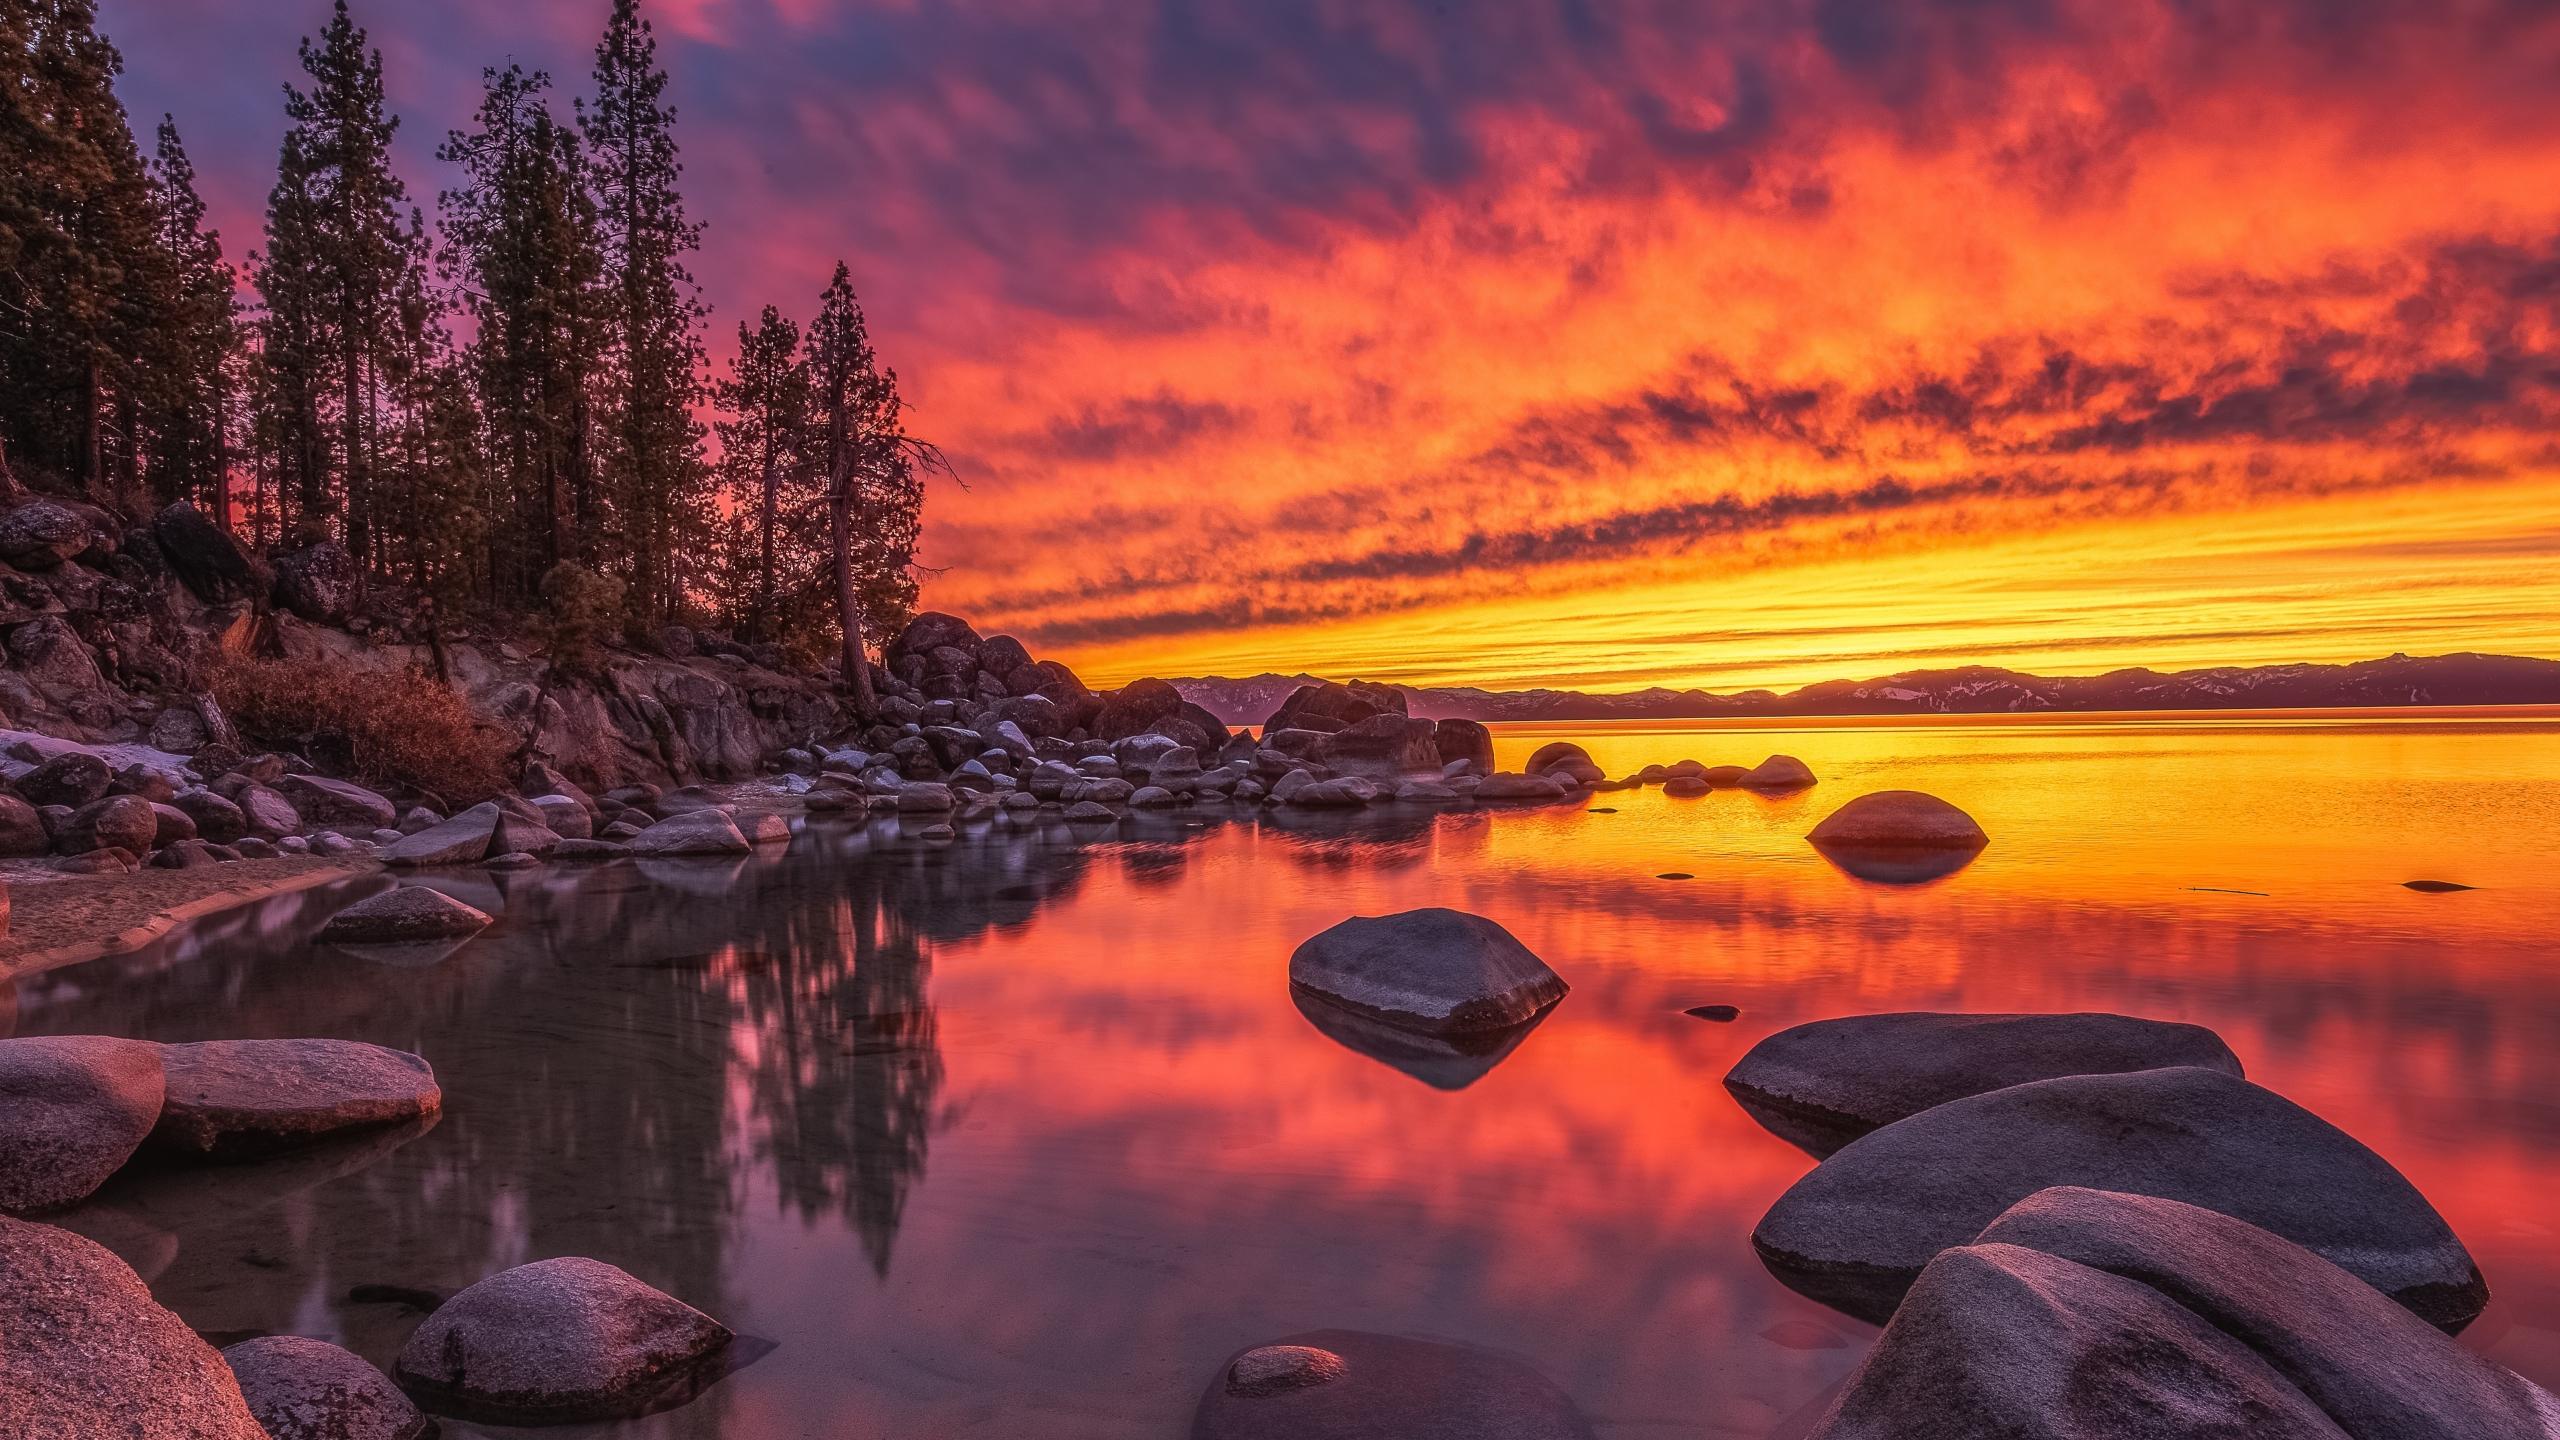 Lake Tahoe Nevada Wallpaper in 2560x1440 Resolution